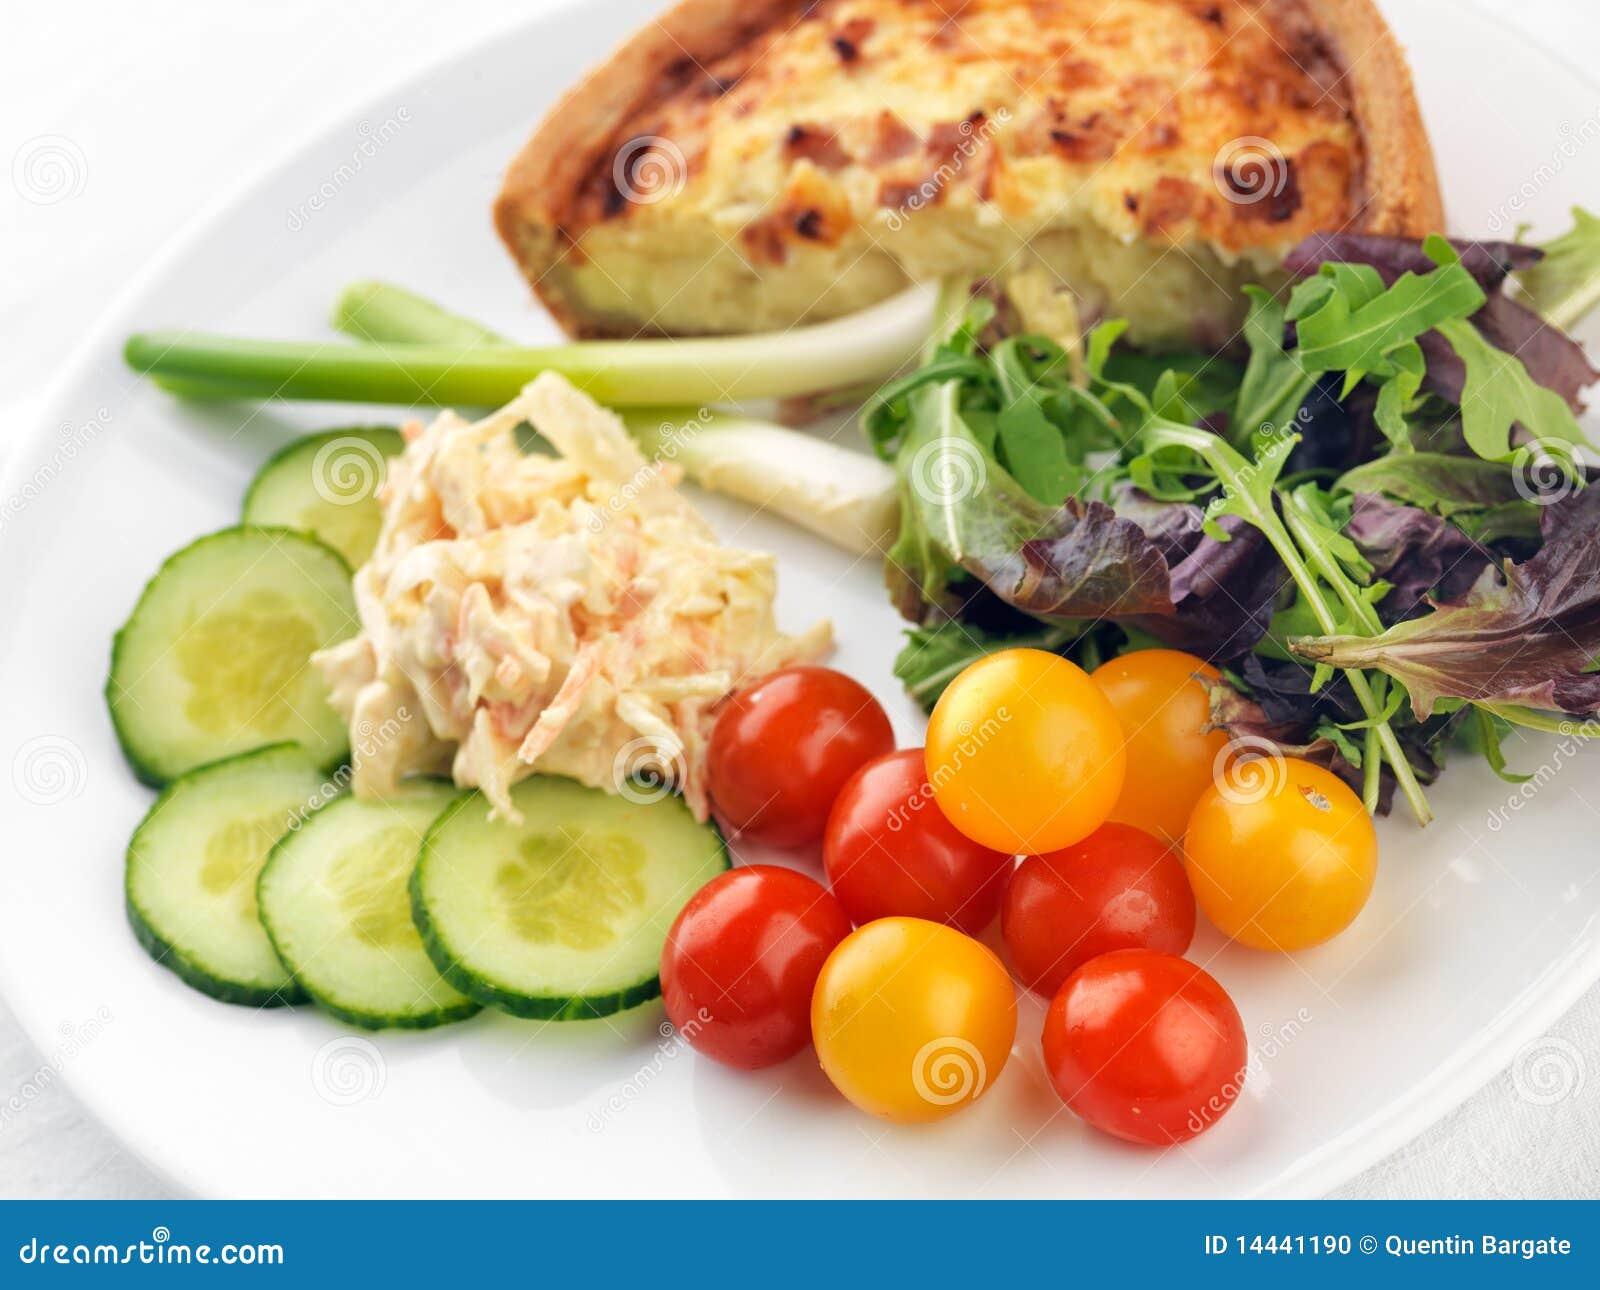 repas sain de salade photo stock image du repas casse 14441190. Black Bedroom Furniture Sets. Home Design Ideas